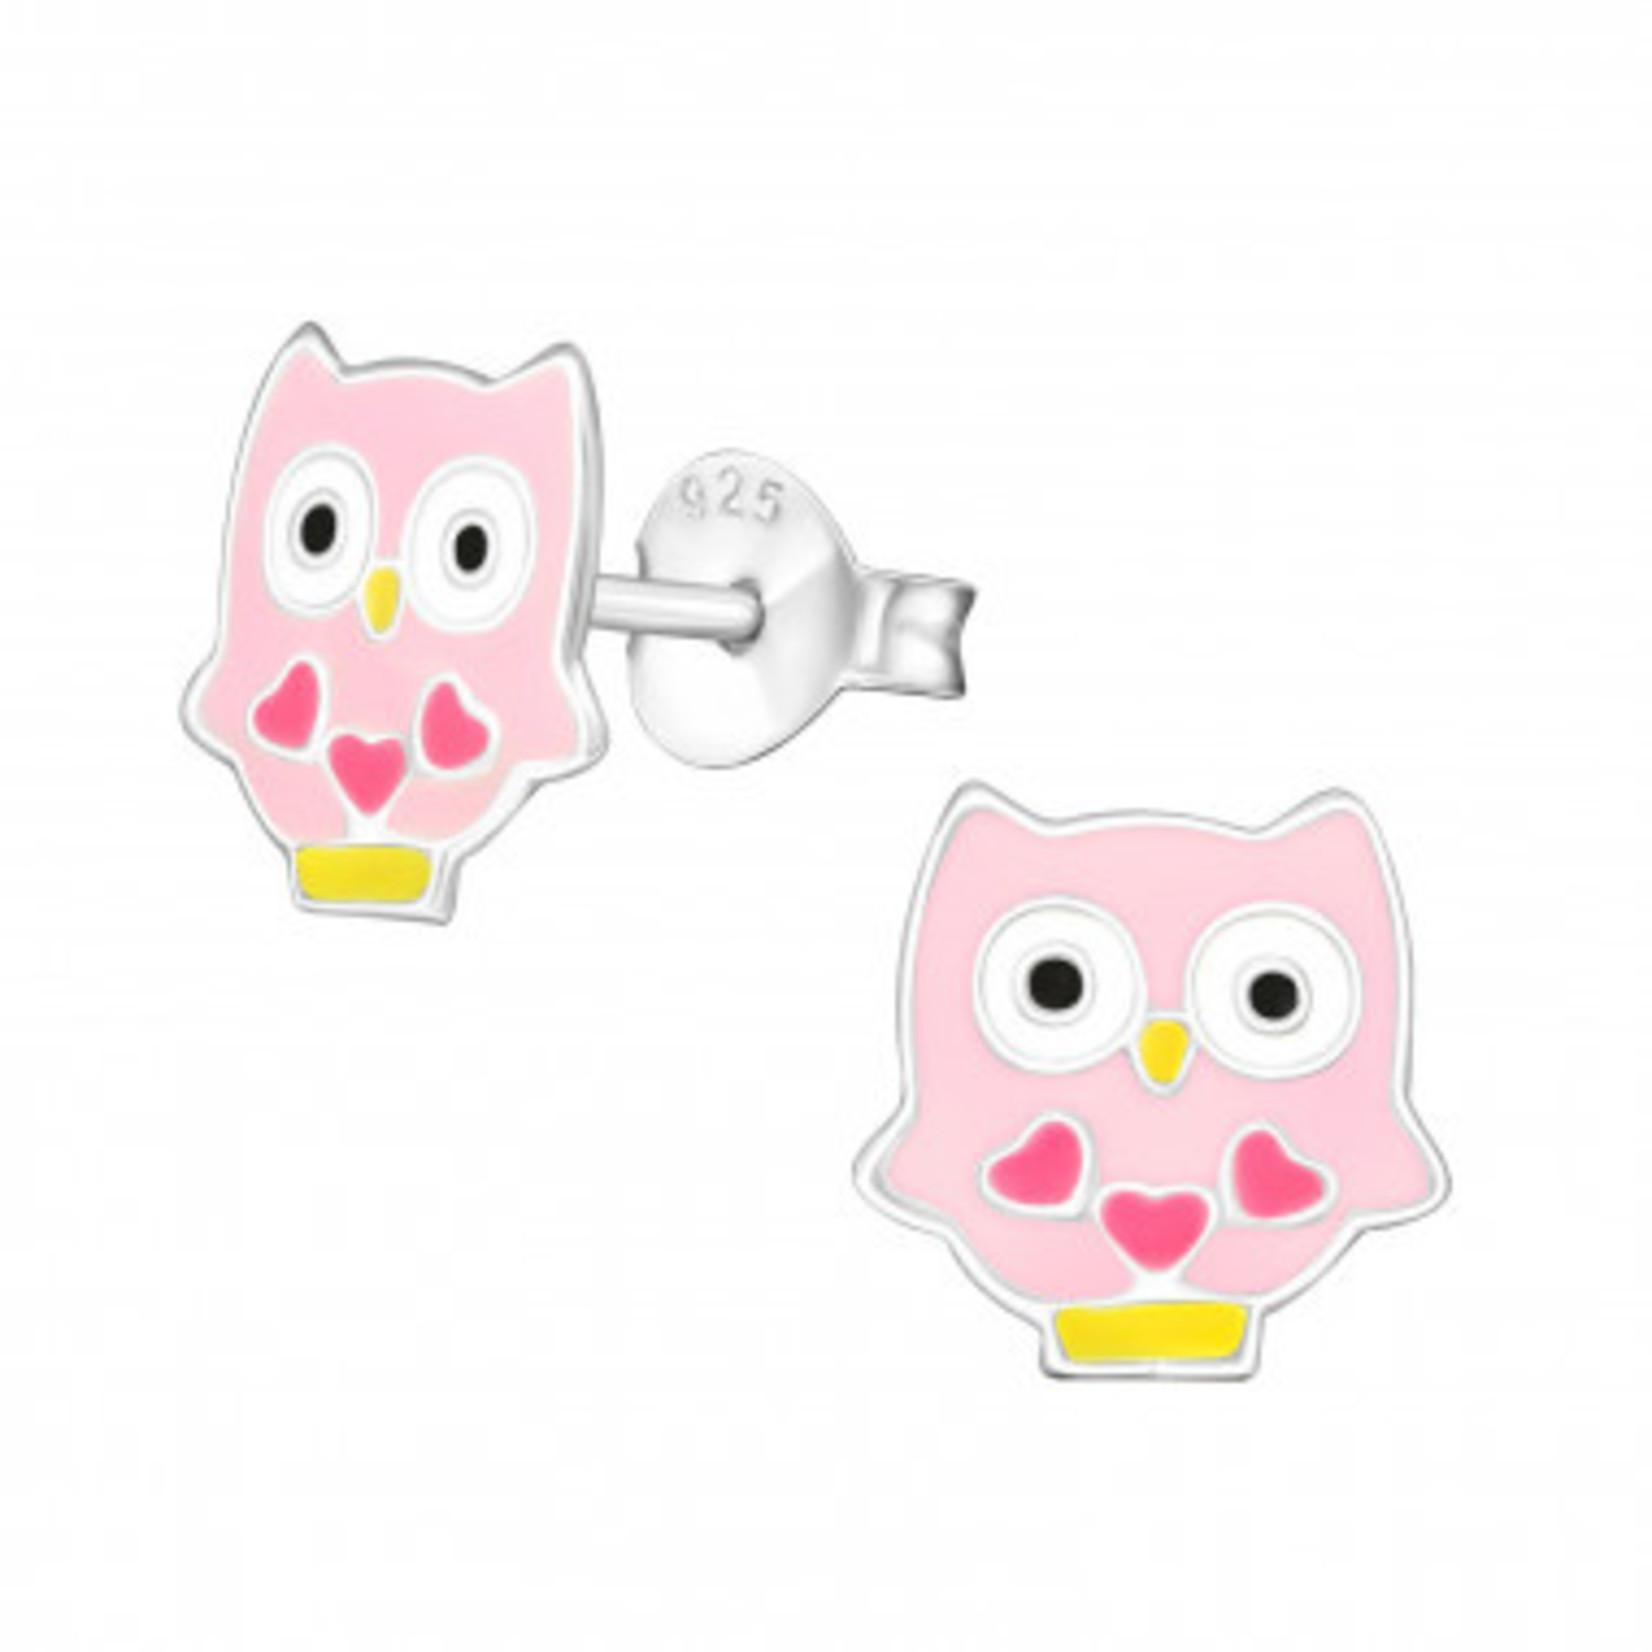 Oorstekers - Uil - Wit met roze hartjes